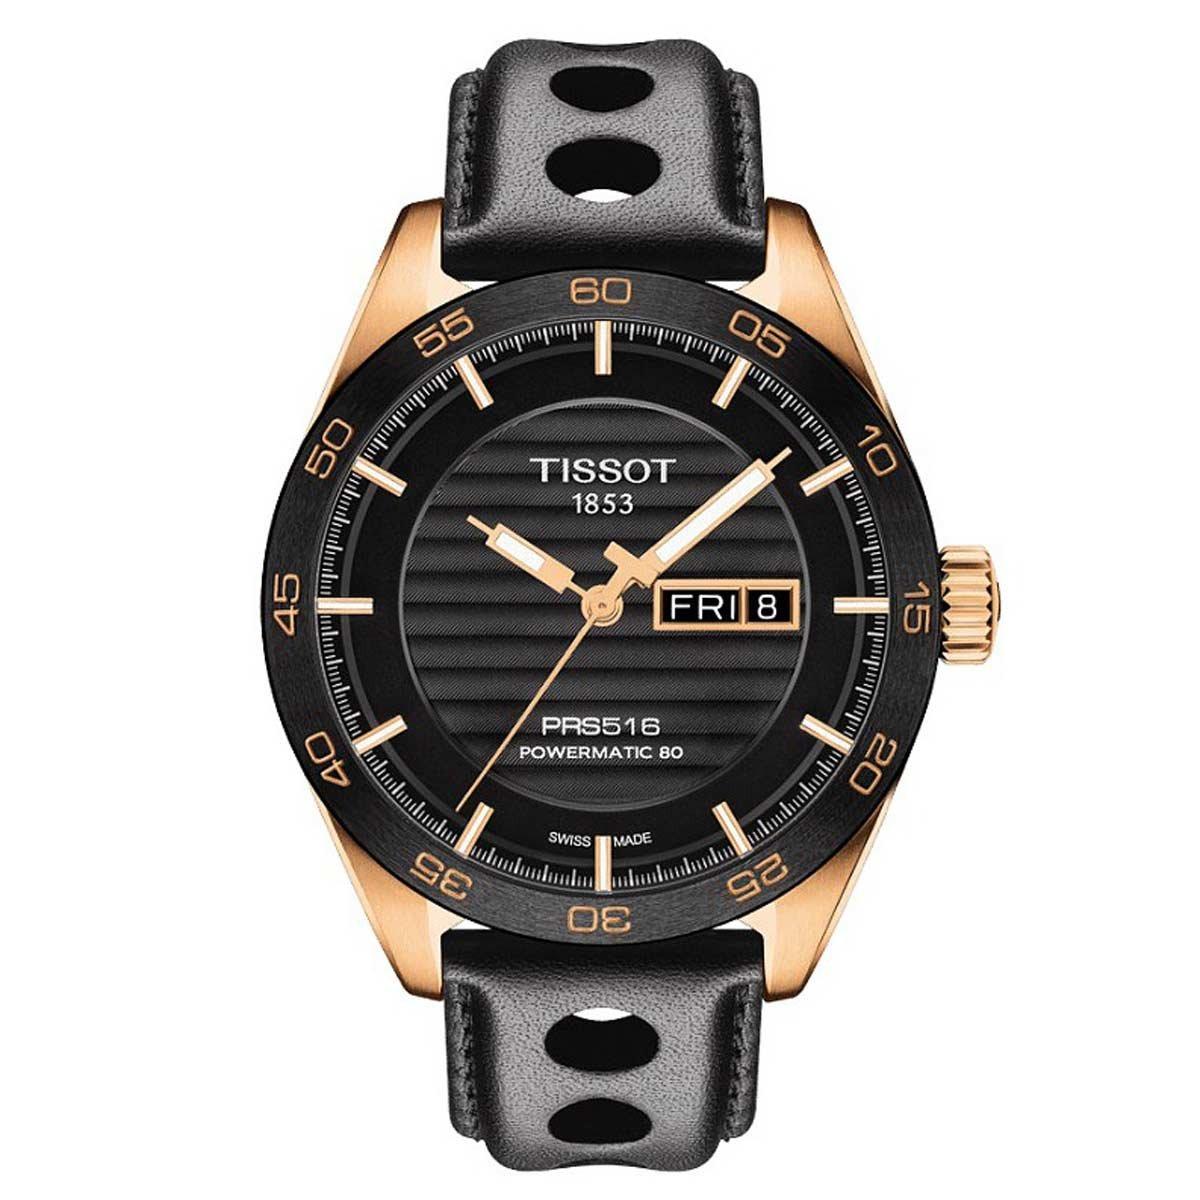 a88b39fde5a4 Reloj Automático Tissot Prs 516 Para Hombre T100430360510 ...